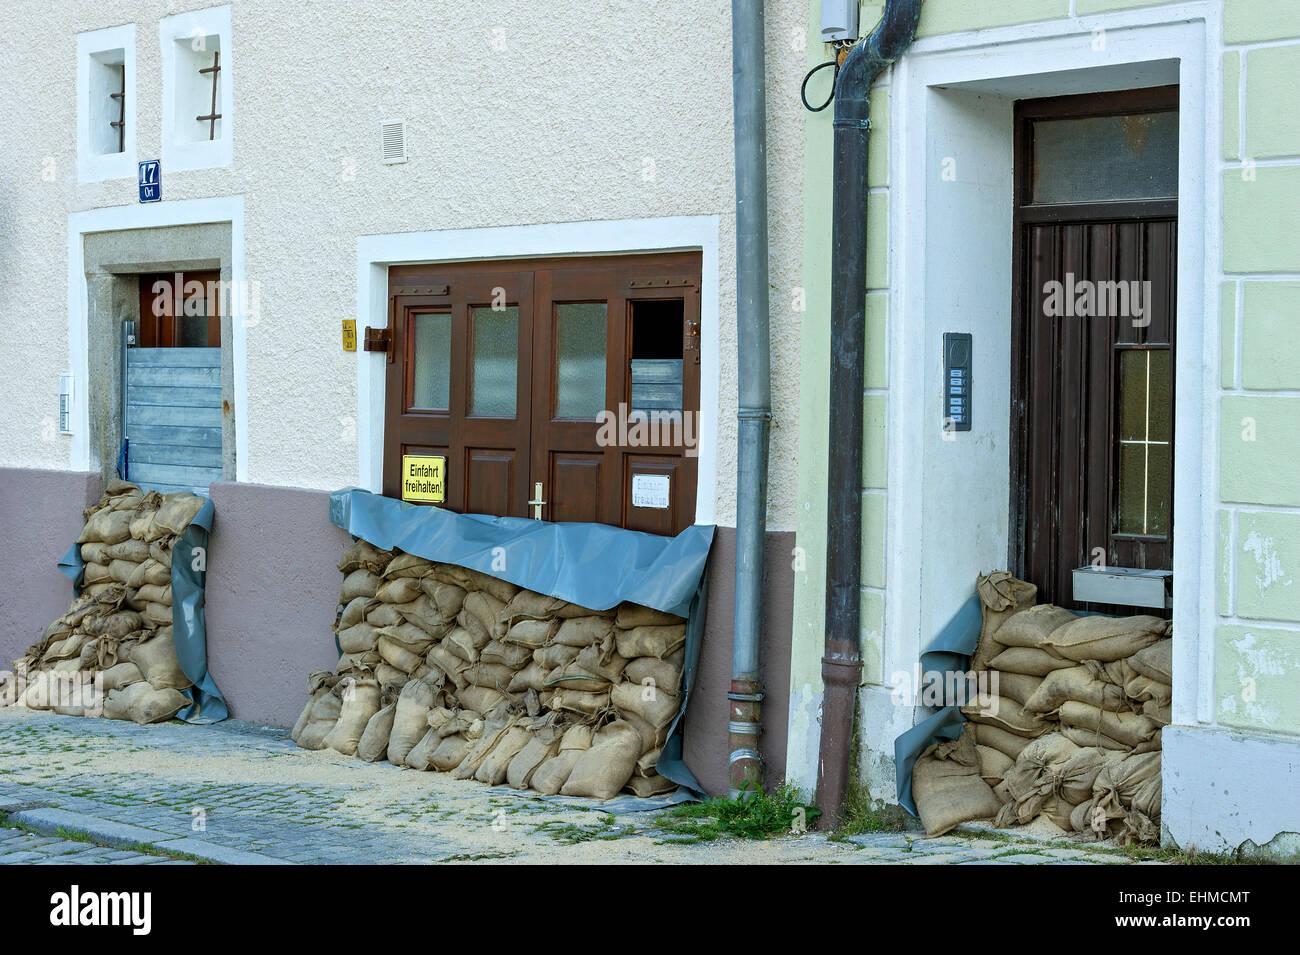 Flood Control Measures Sandbags And A Protective Wall Of